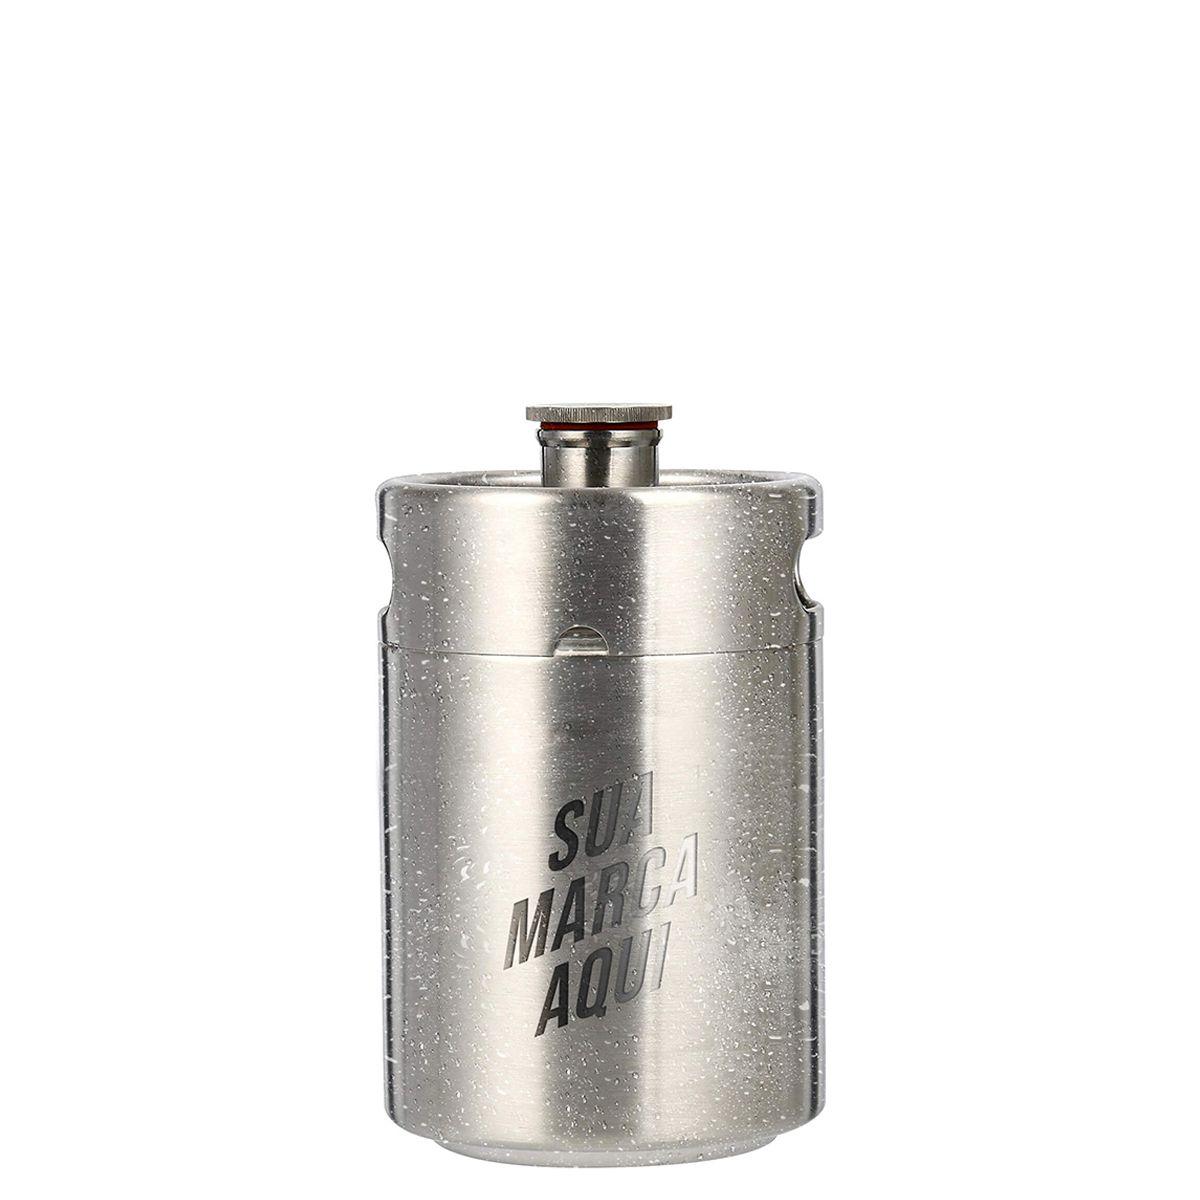 Mini Keg de aço inox - 5L personalizado em laser